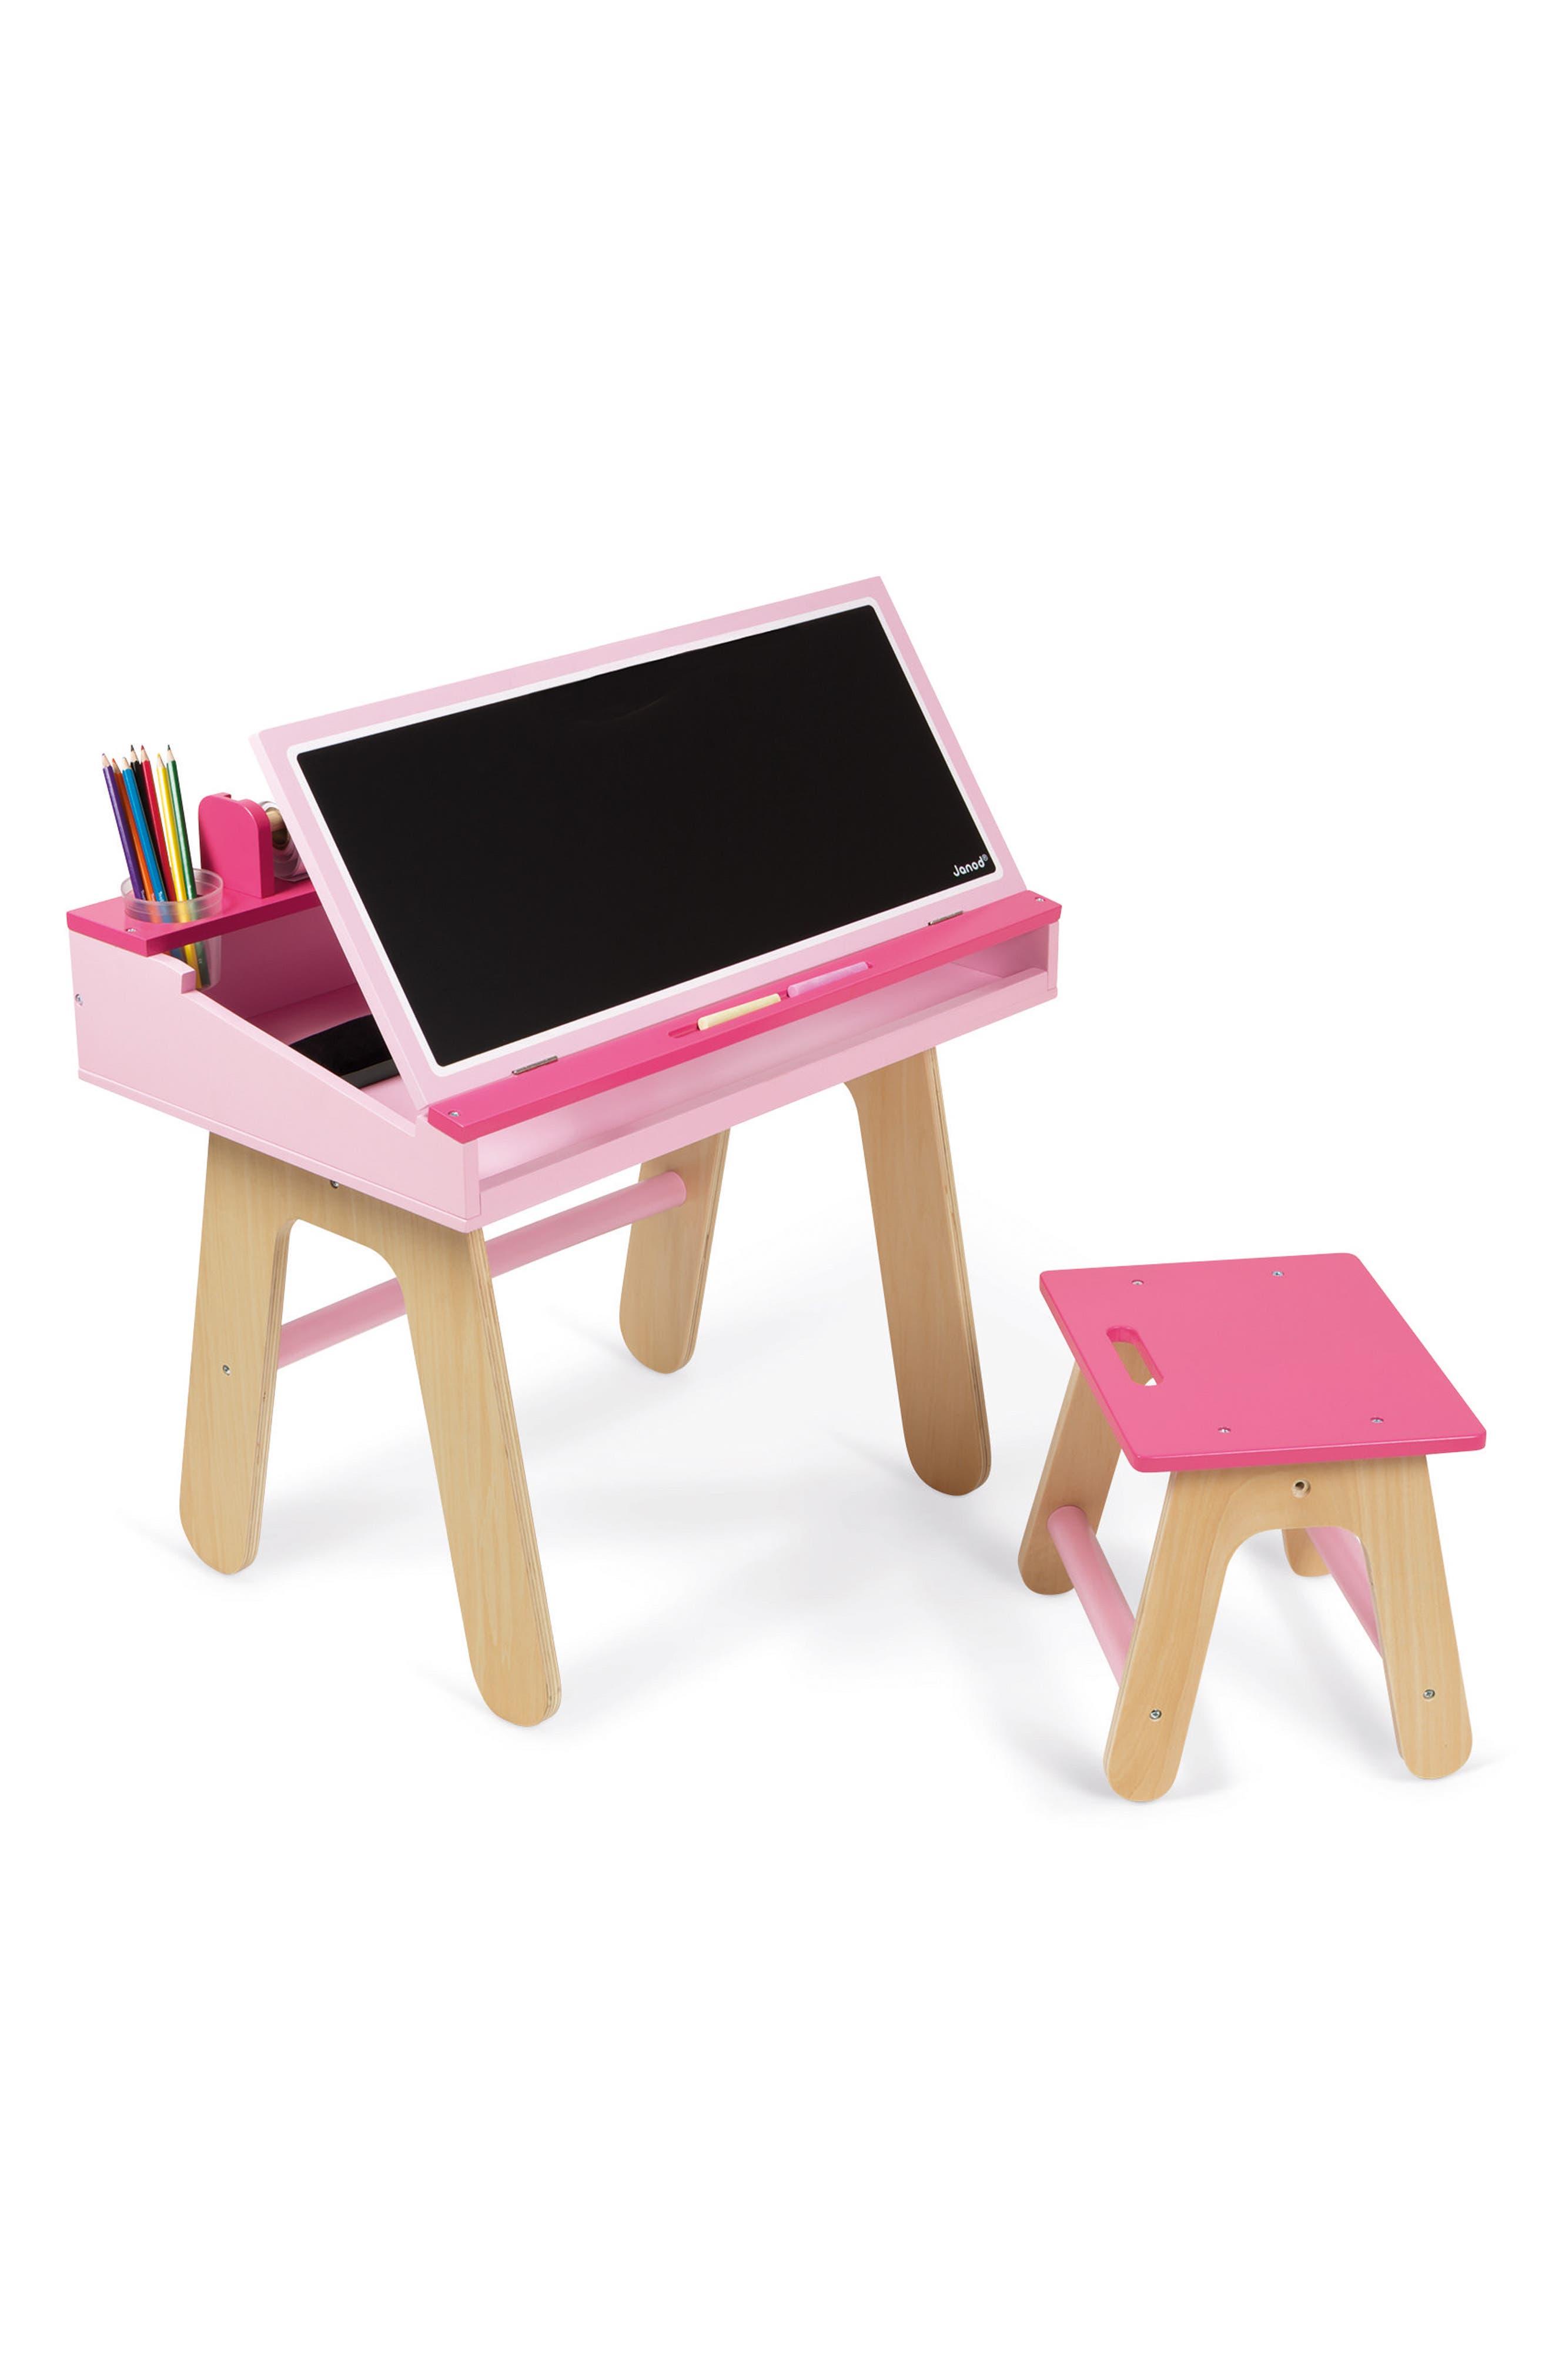 Main Image - Janod Easel Top Desk & Chair Set